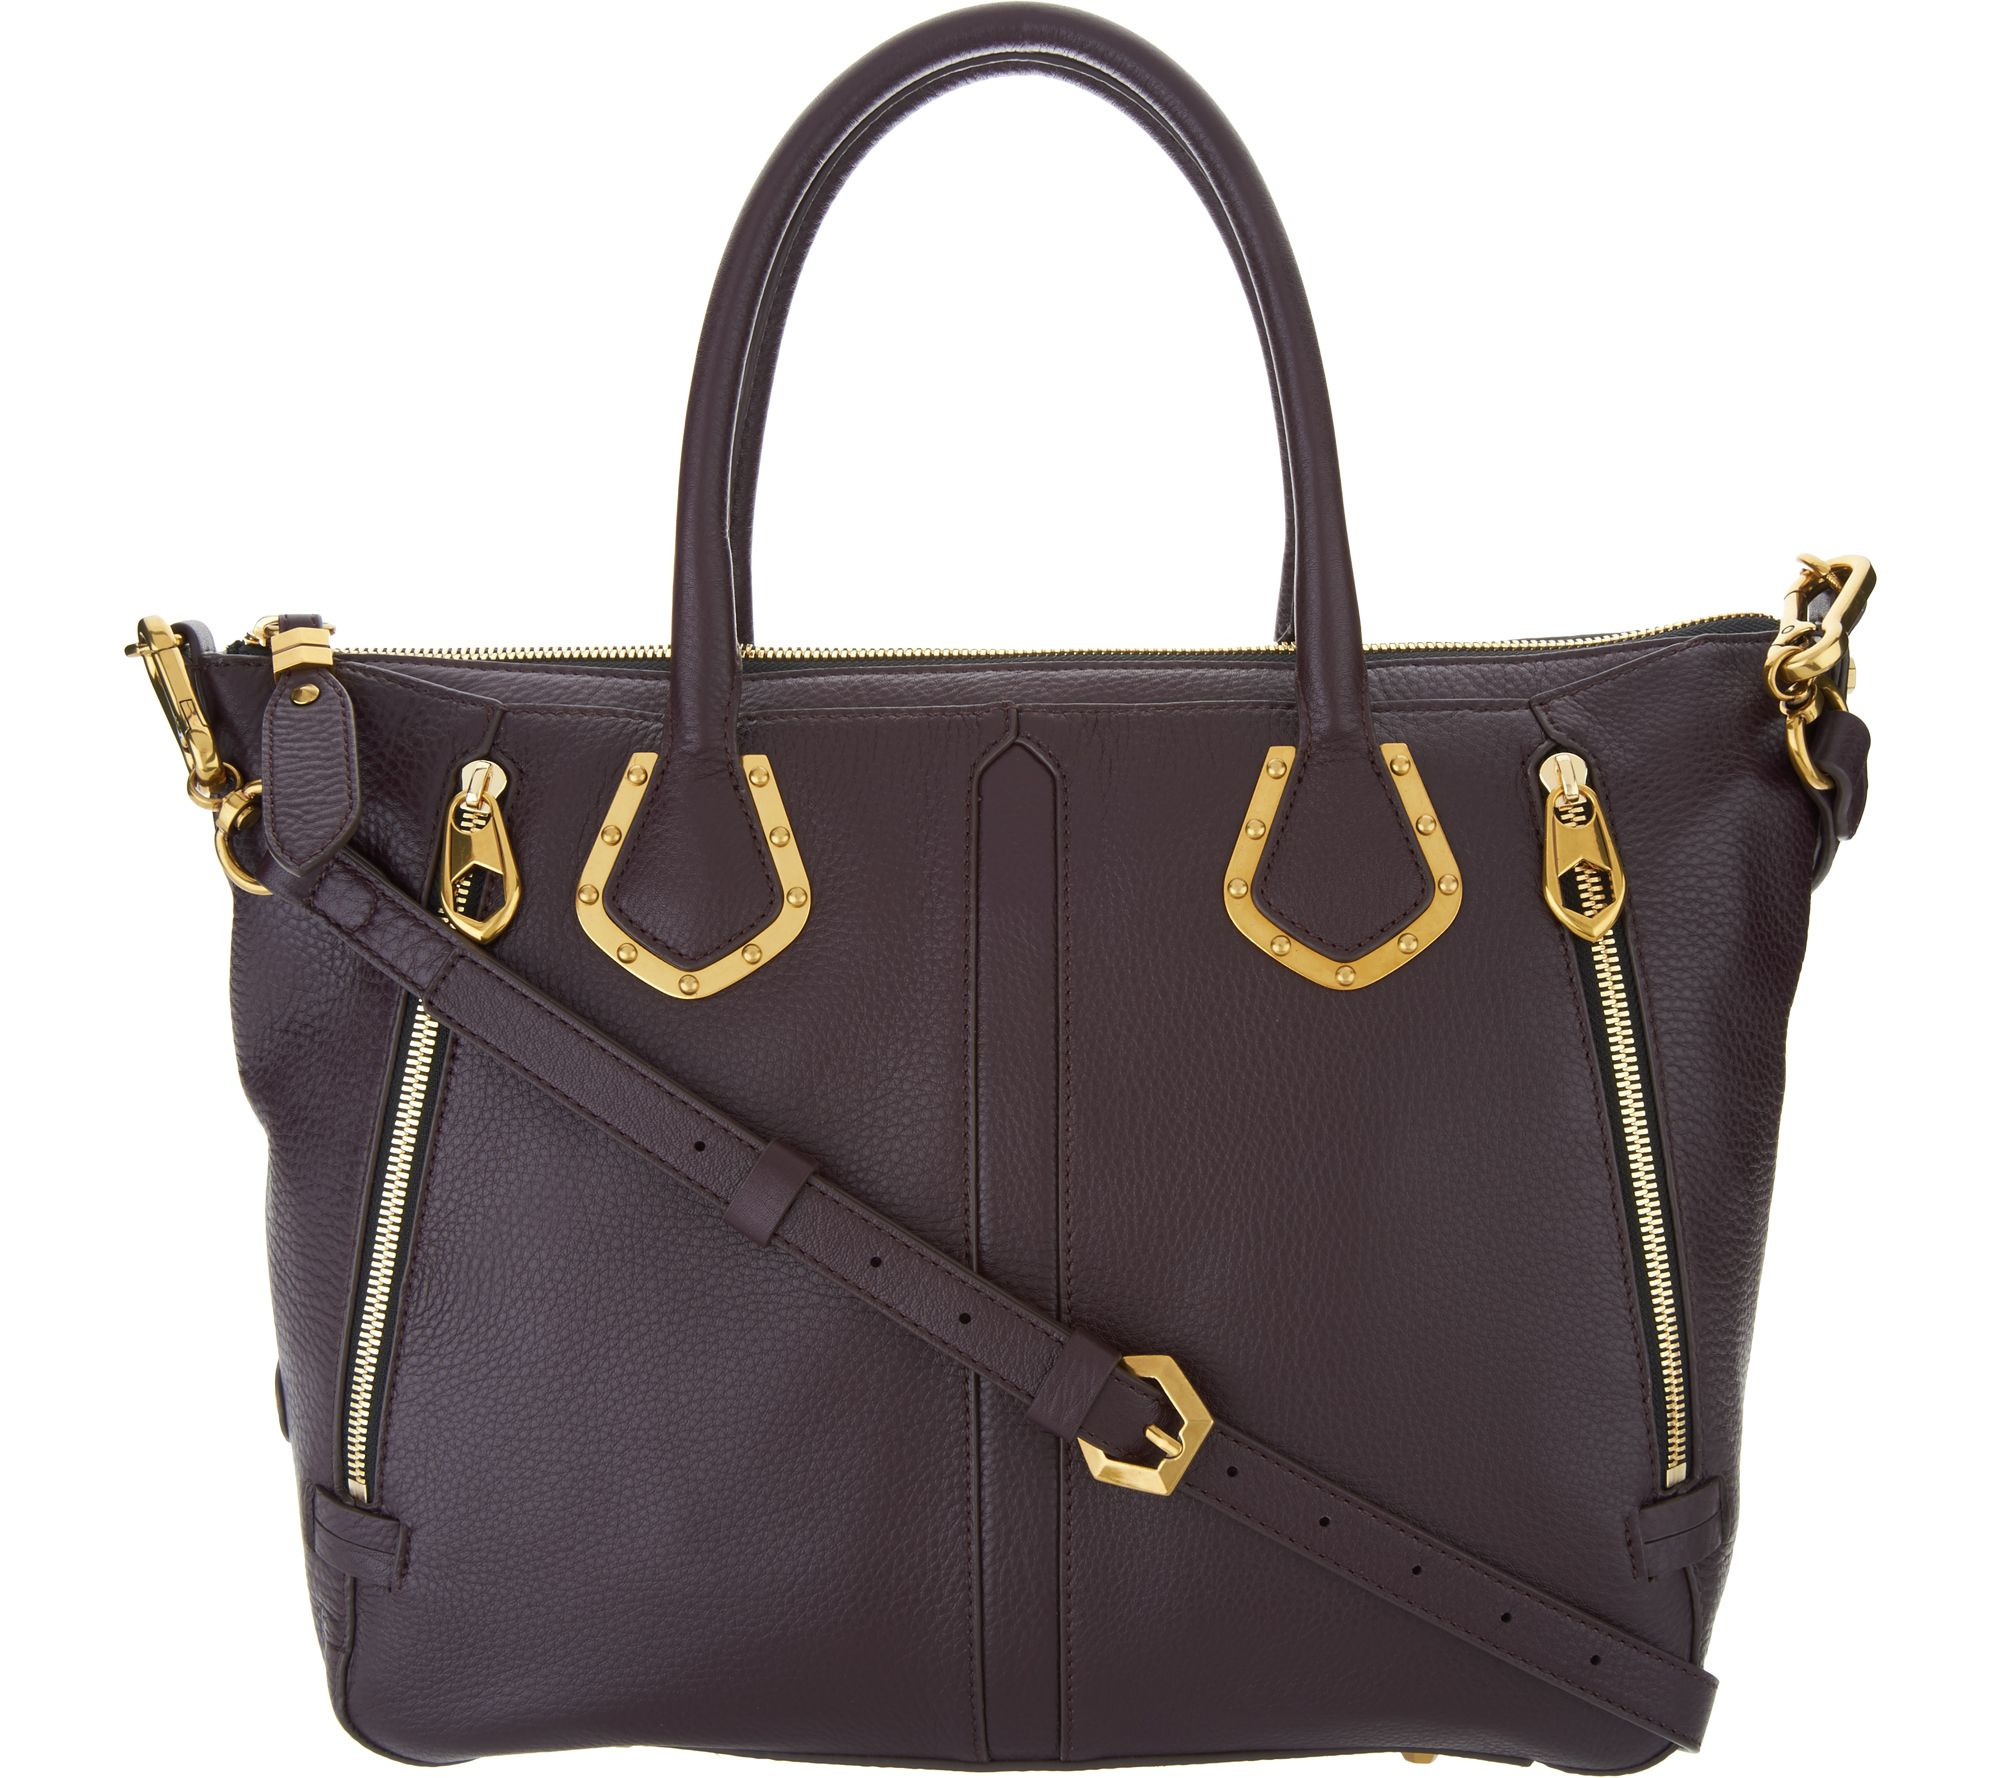 3ff5b0cdbda2 orYANY Pebble Leather Satchel Handbag -Nicole - Page 1 — QVC.com